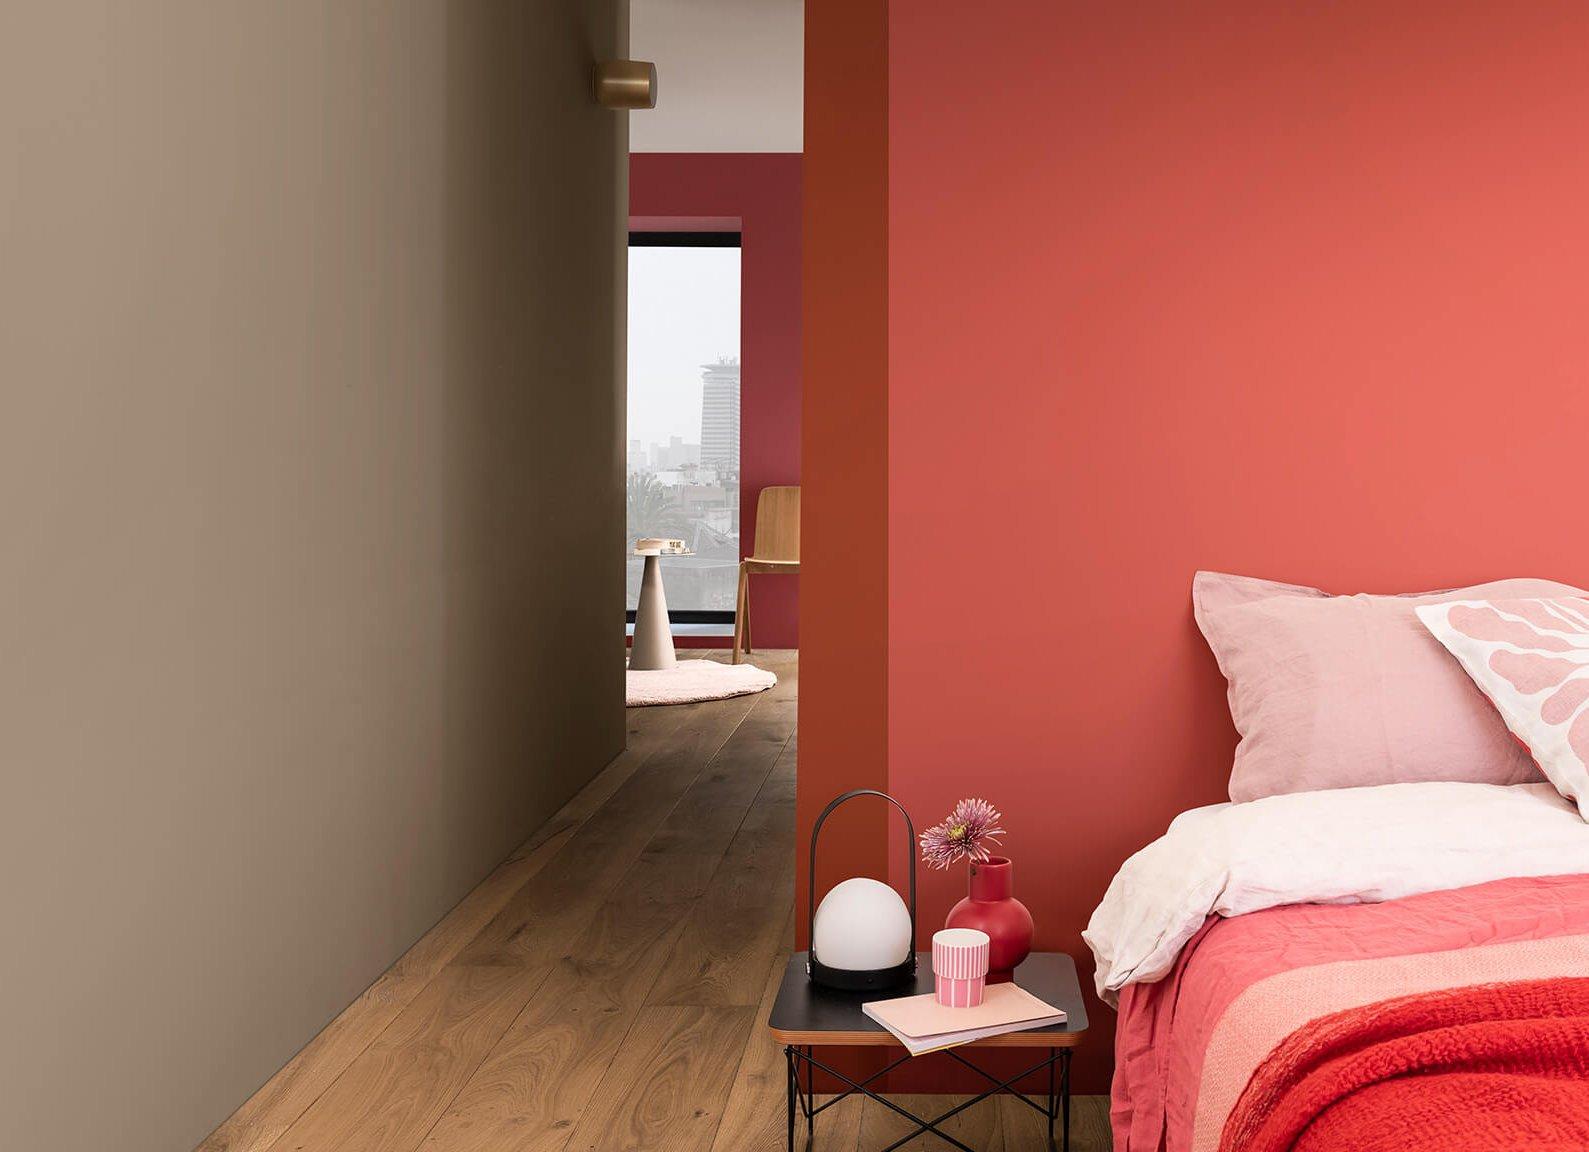 brave ground dulux colour year 2021 interior cozy bedroom